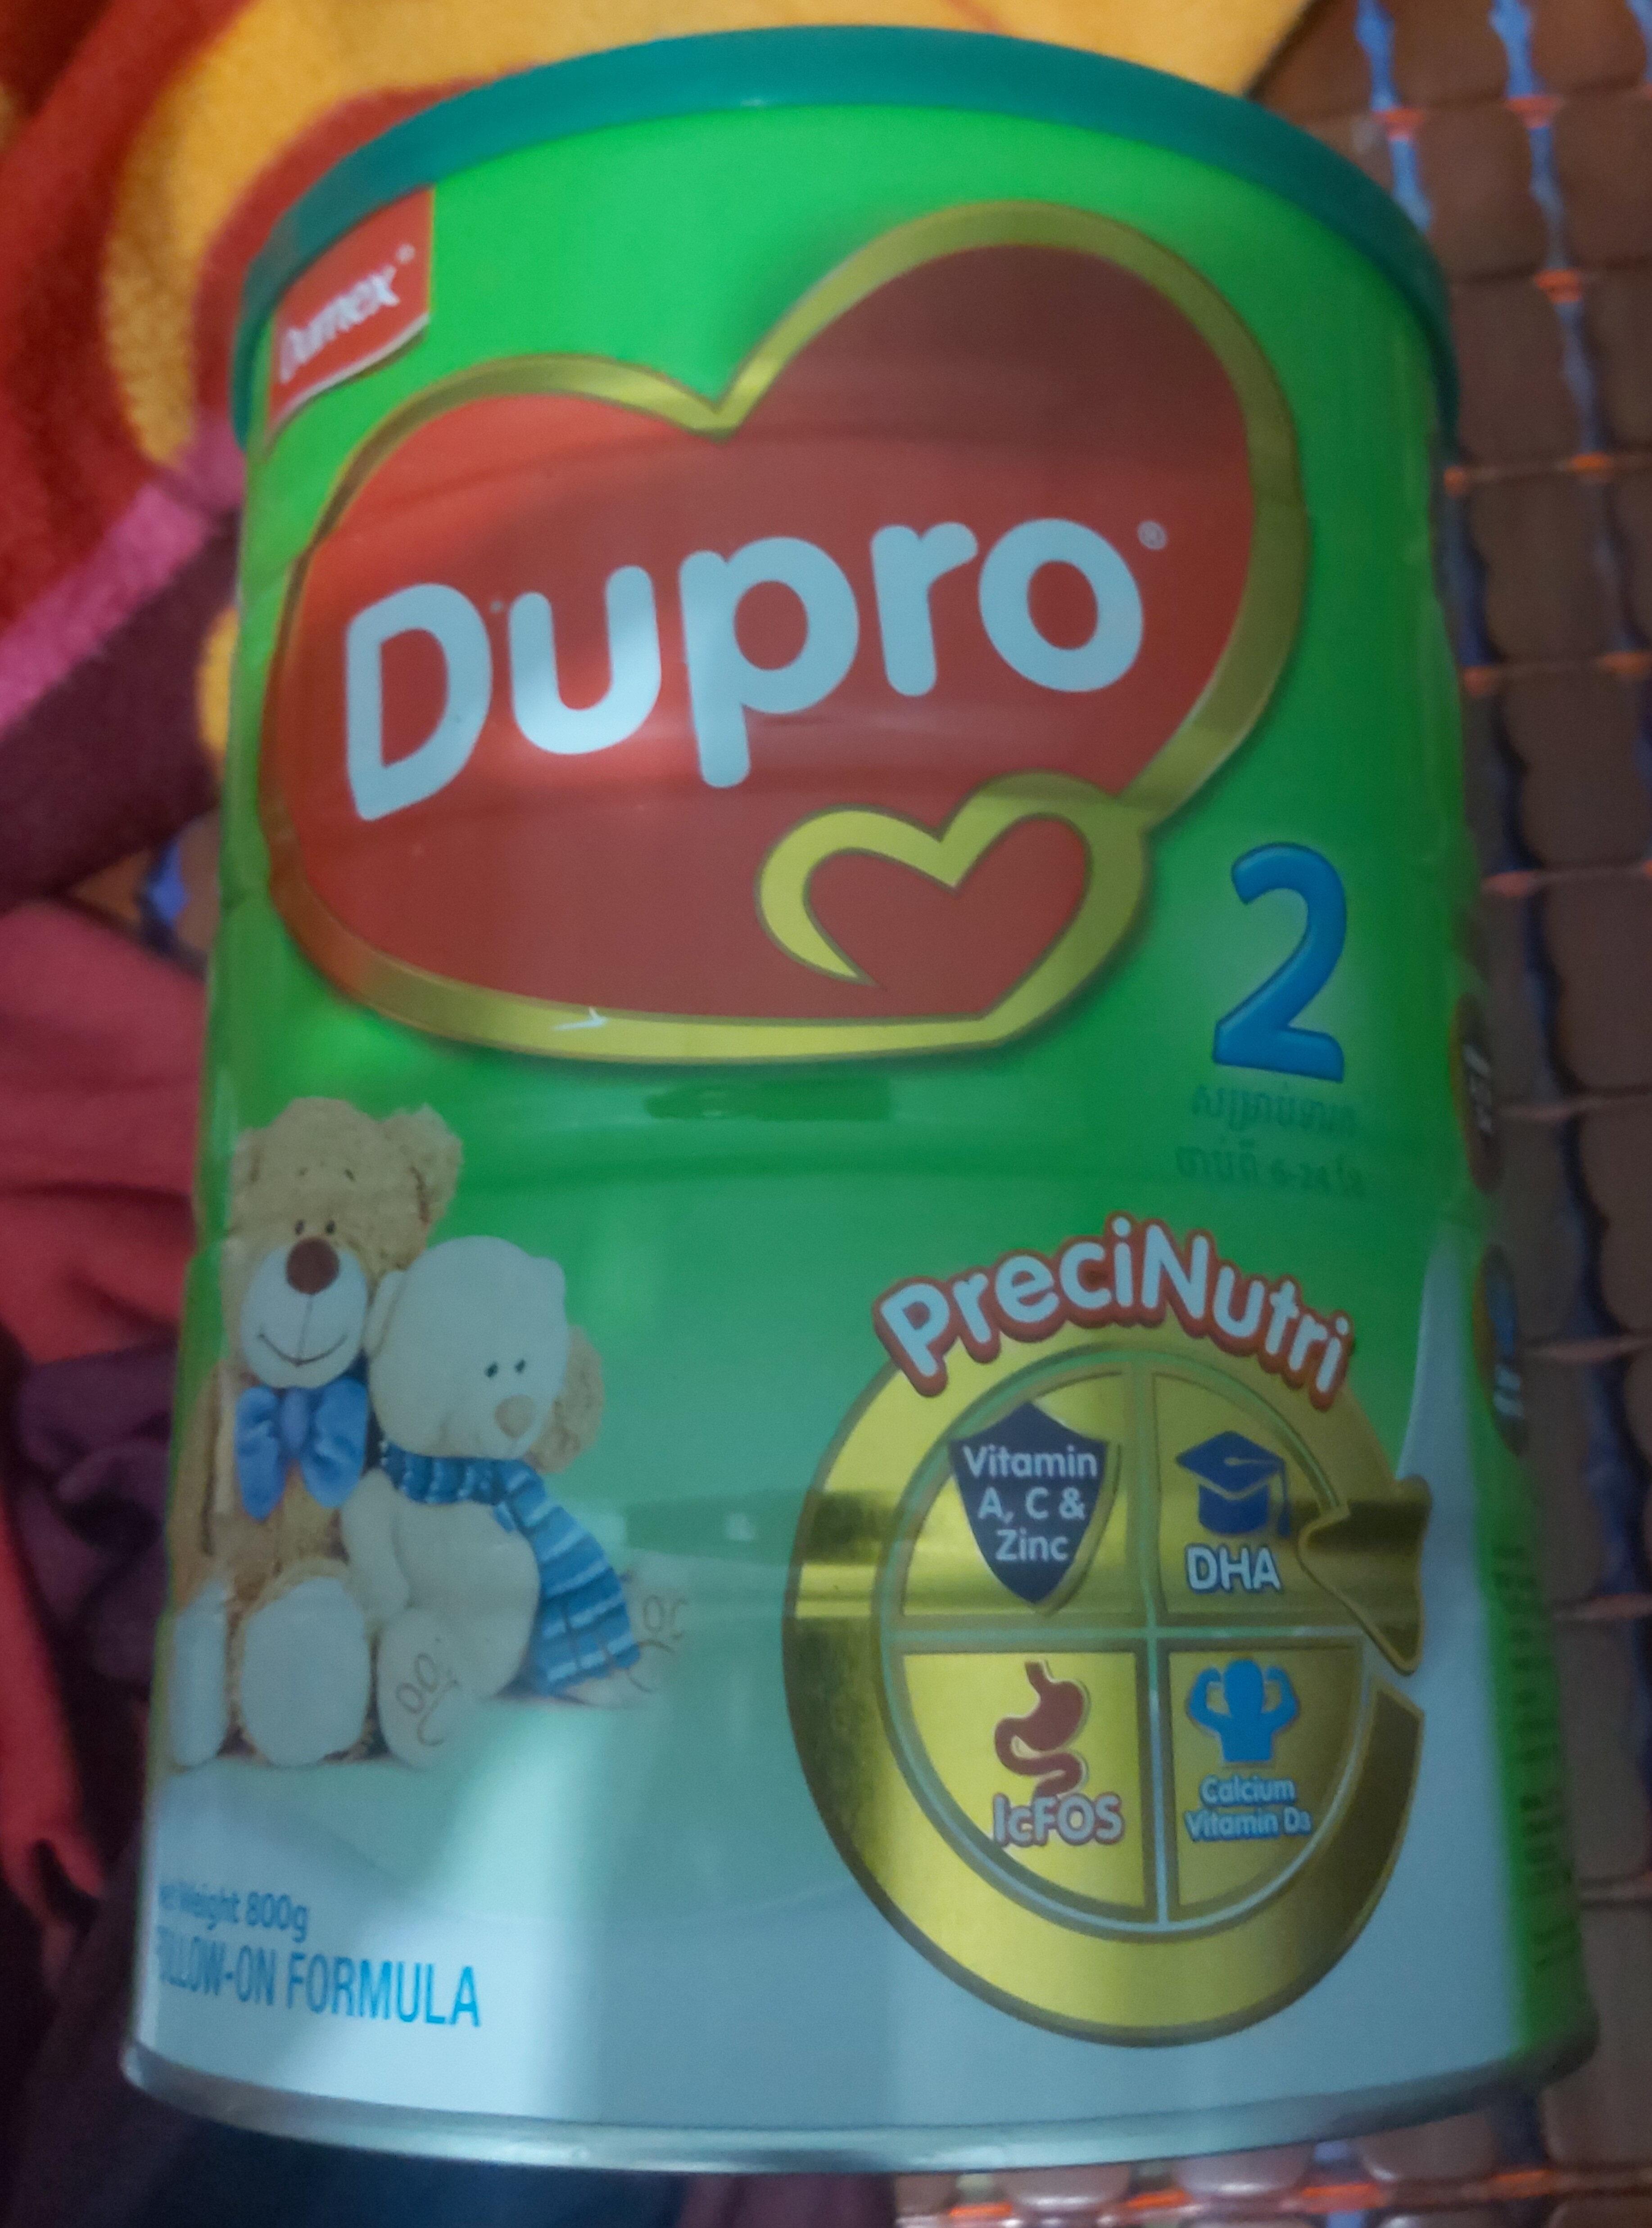 Dupro 2 - Product - km